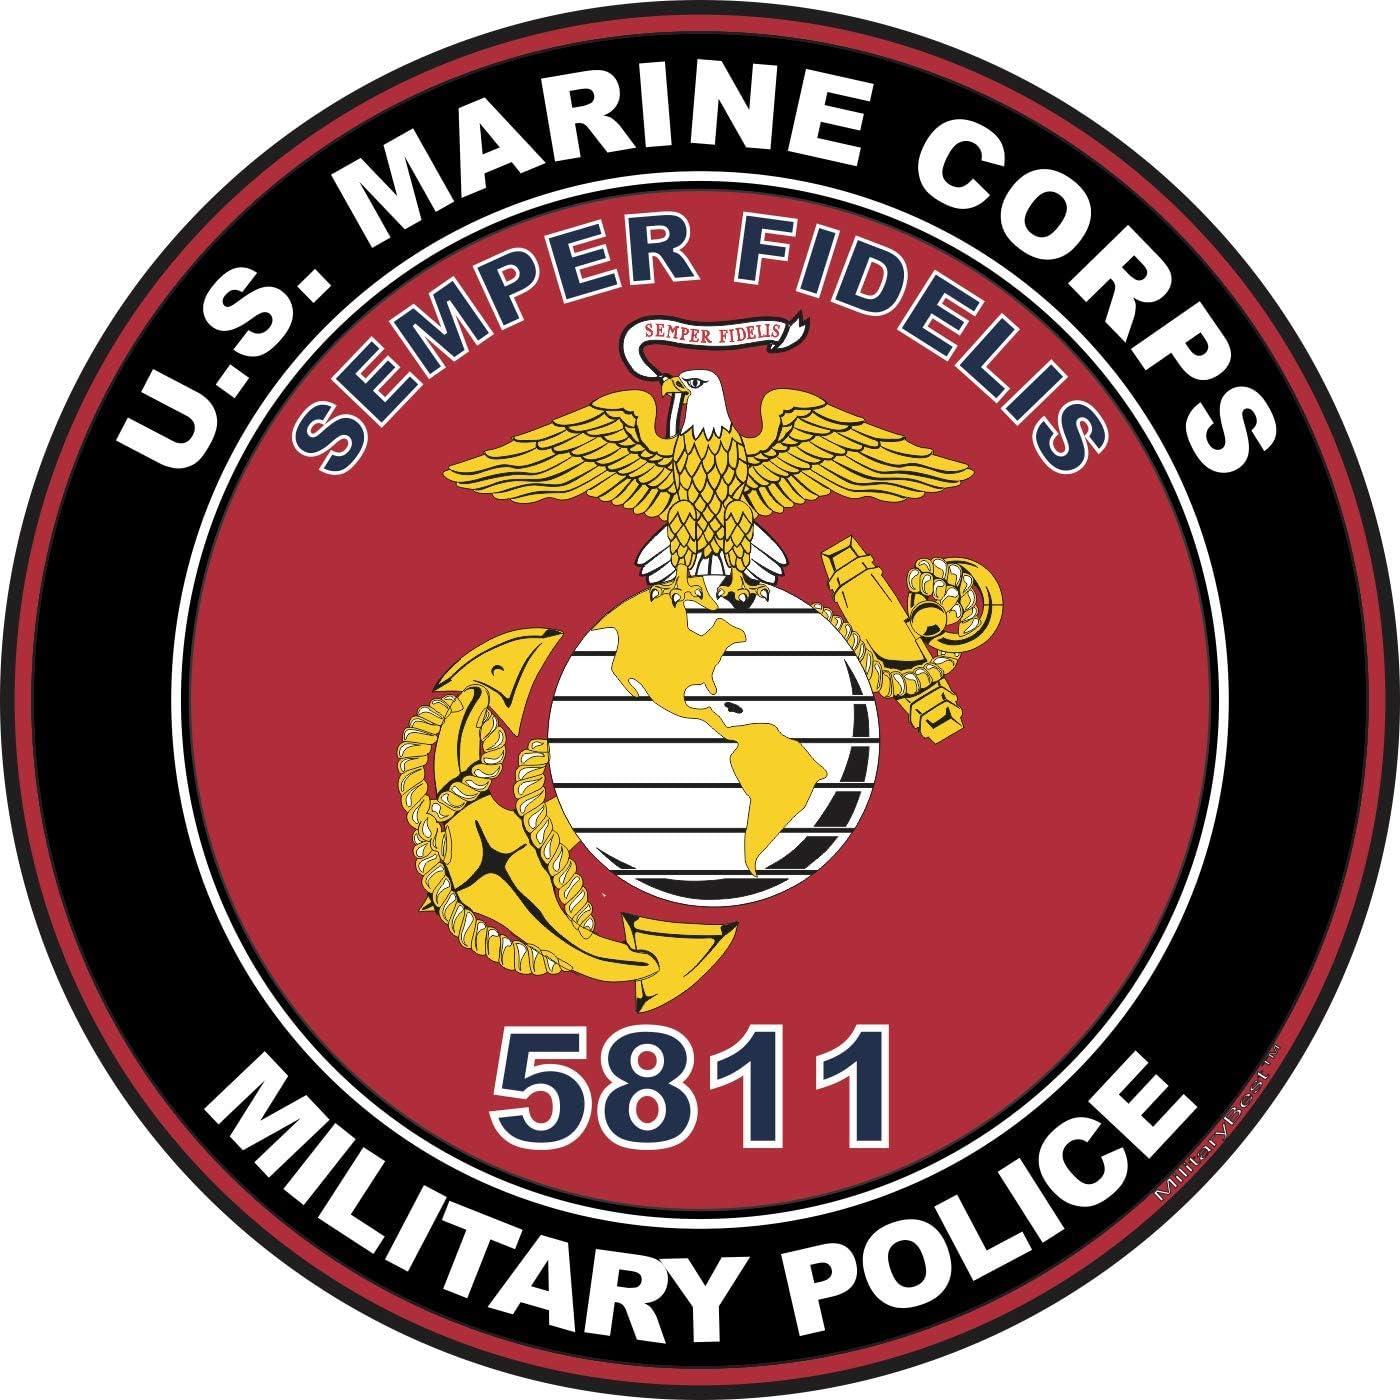 USMC Semper Fidelis Decal United States Marine Corps High Quality Reflective 3M